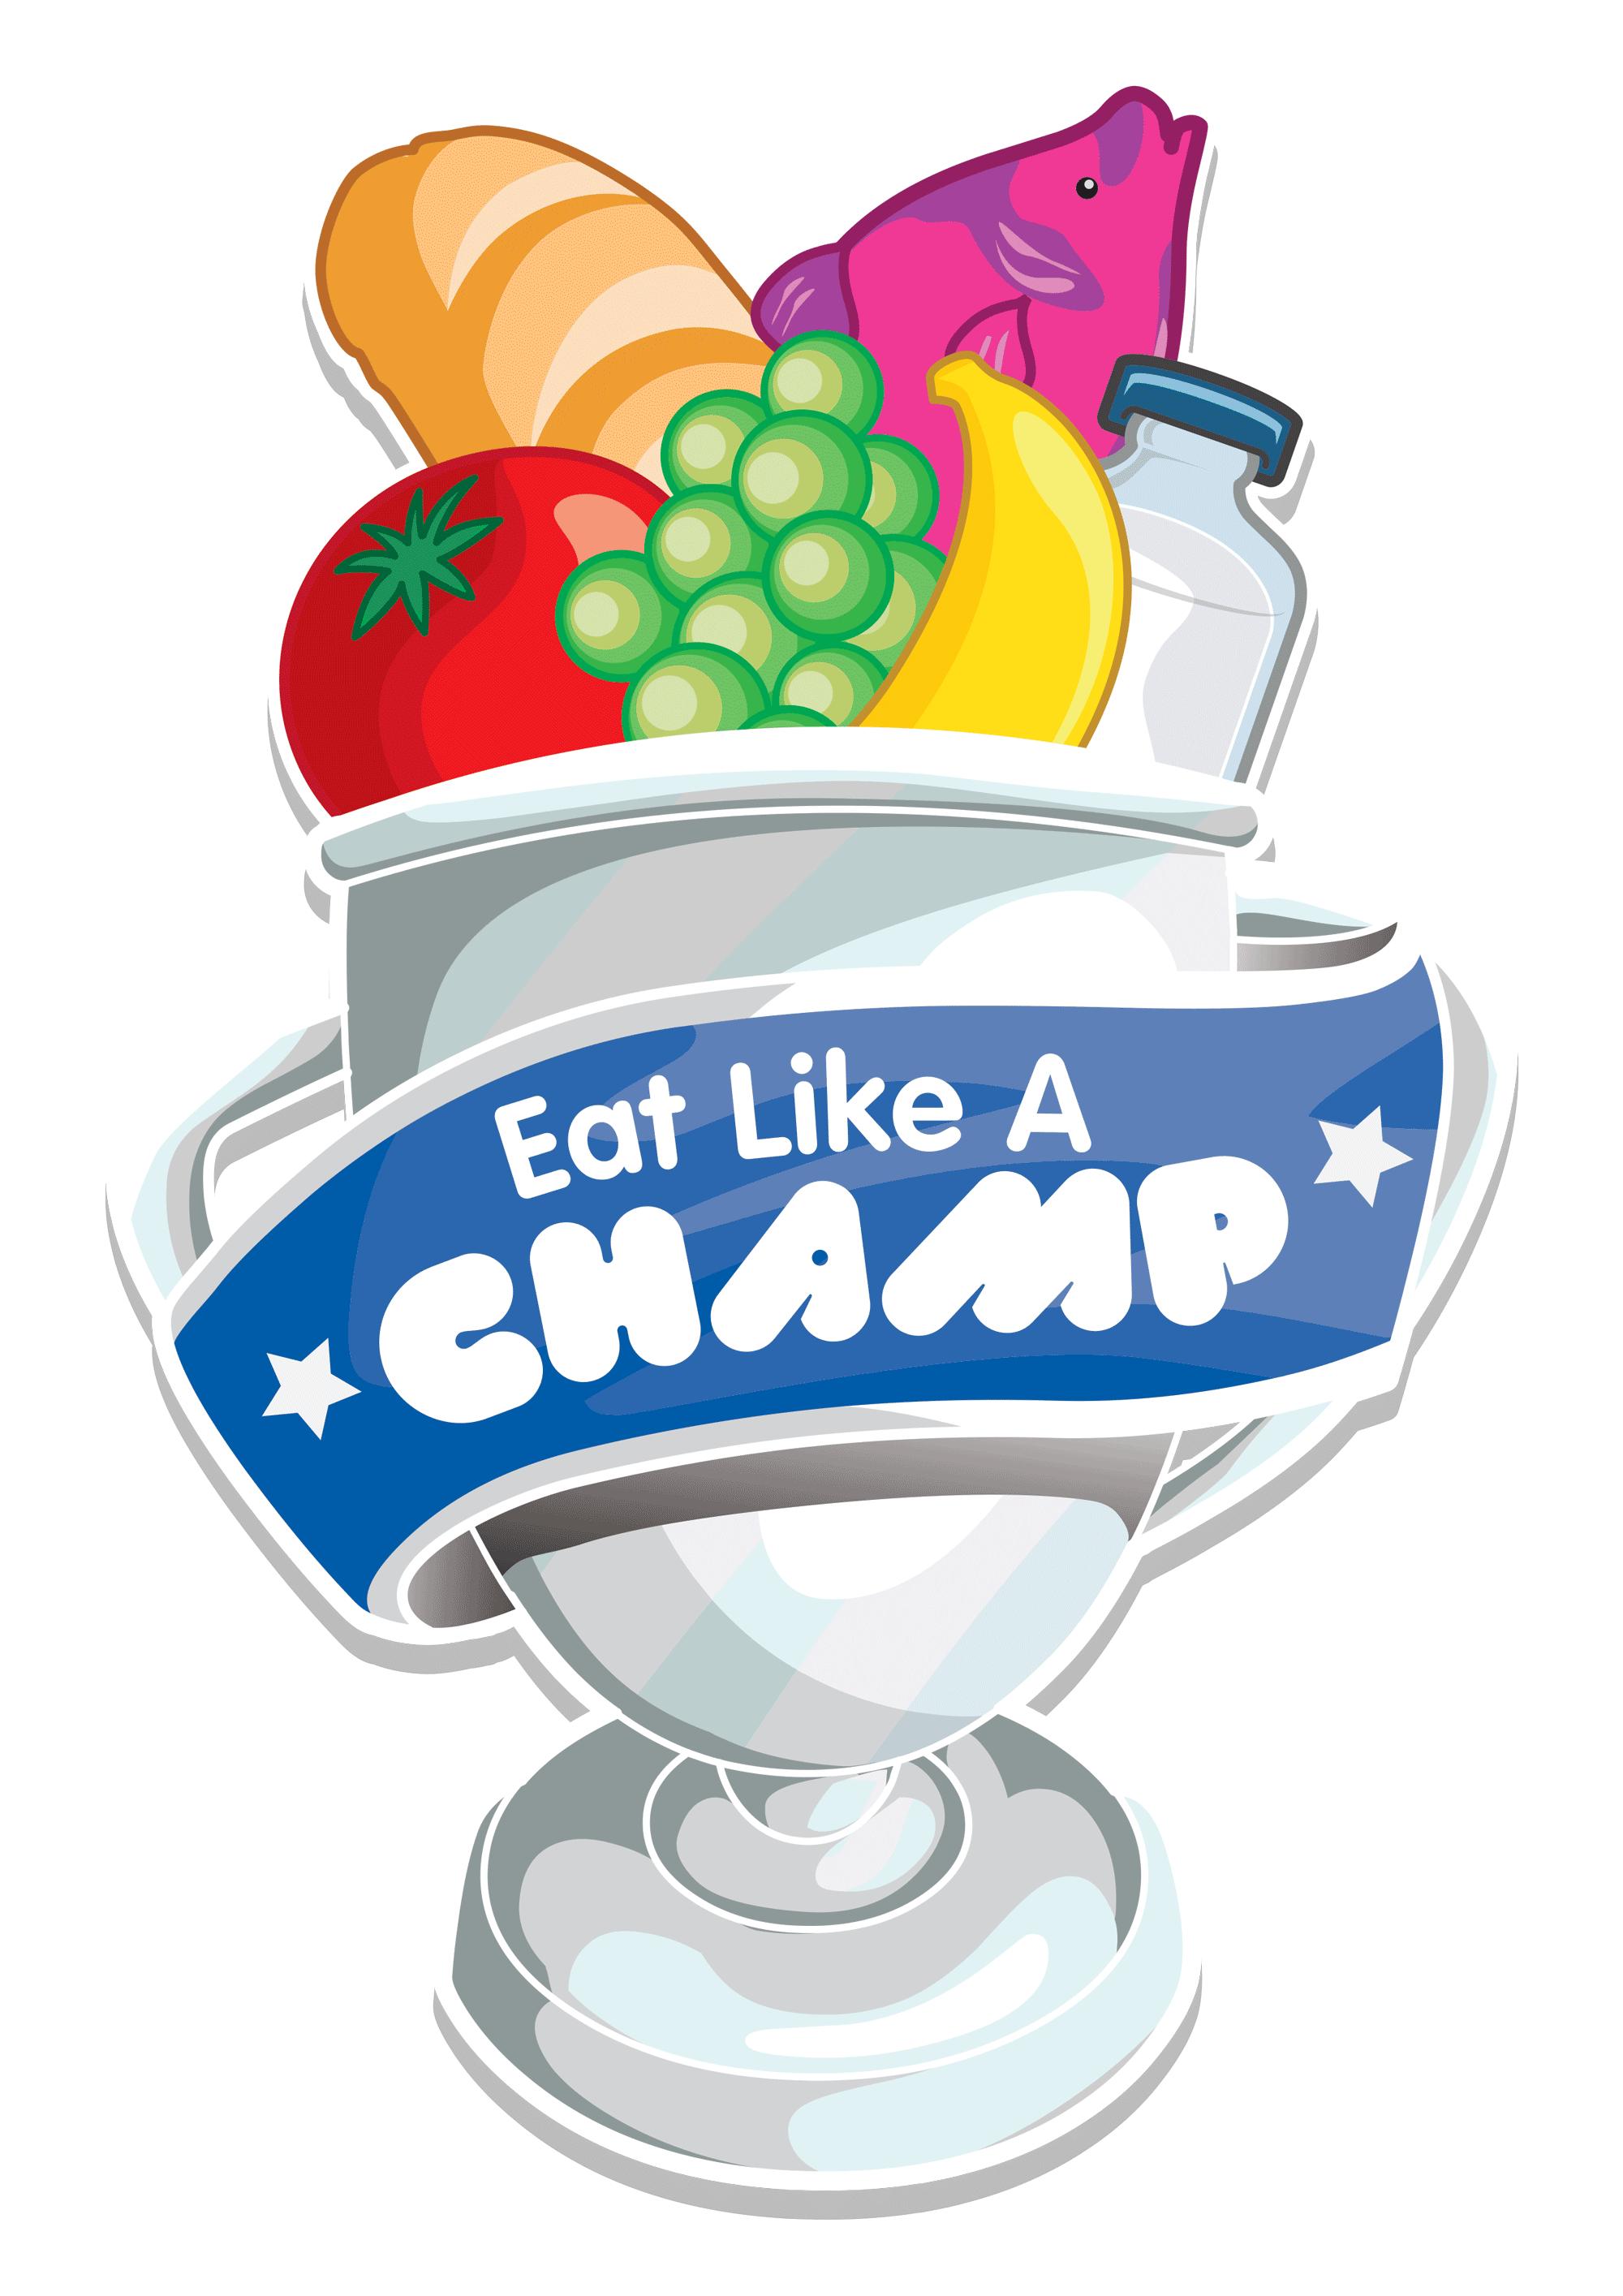 Yogurt clipart healthy dessert. Eat like a champ